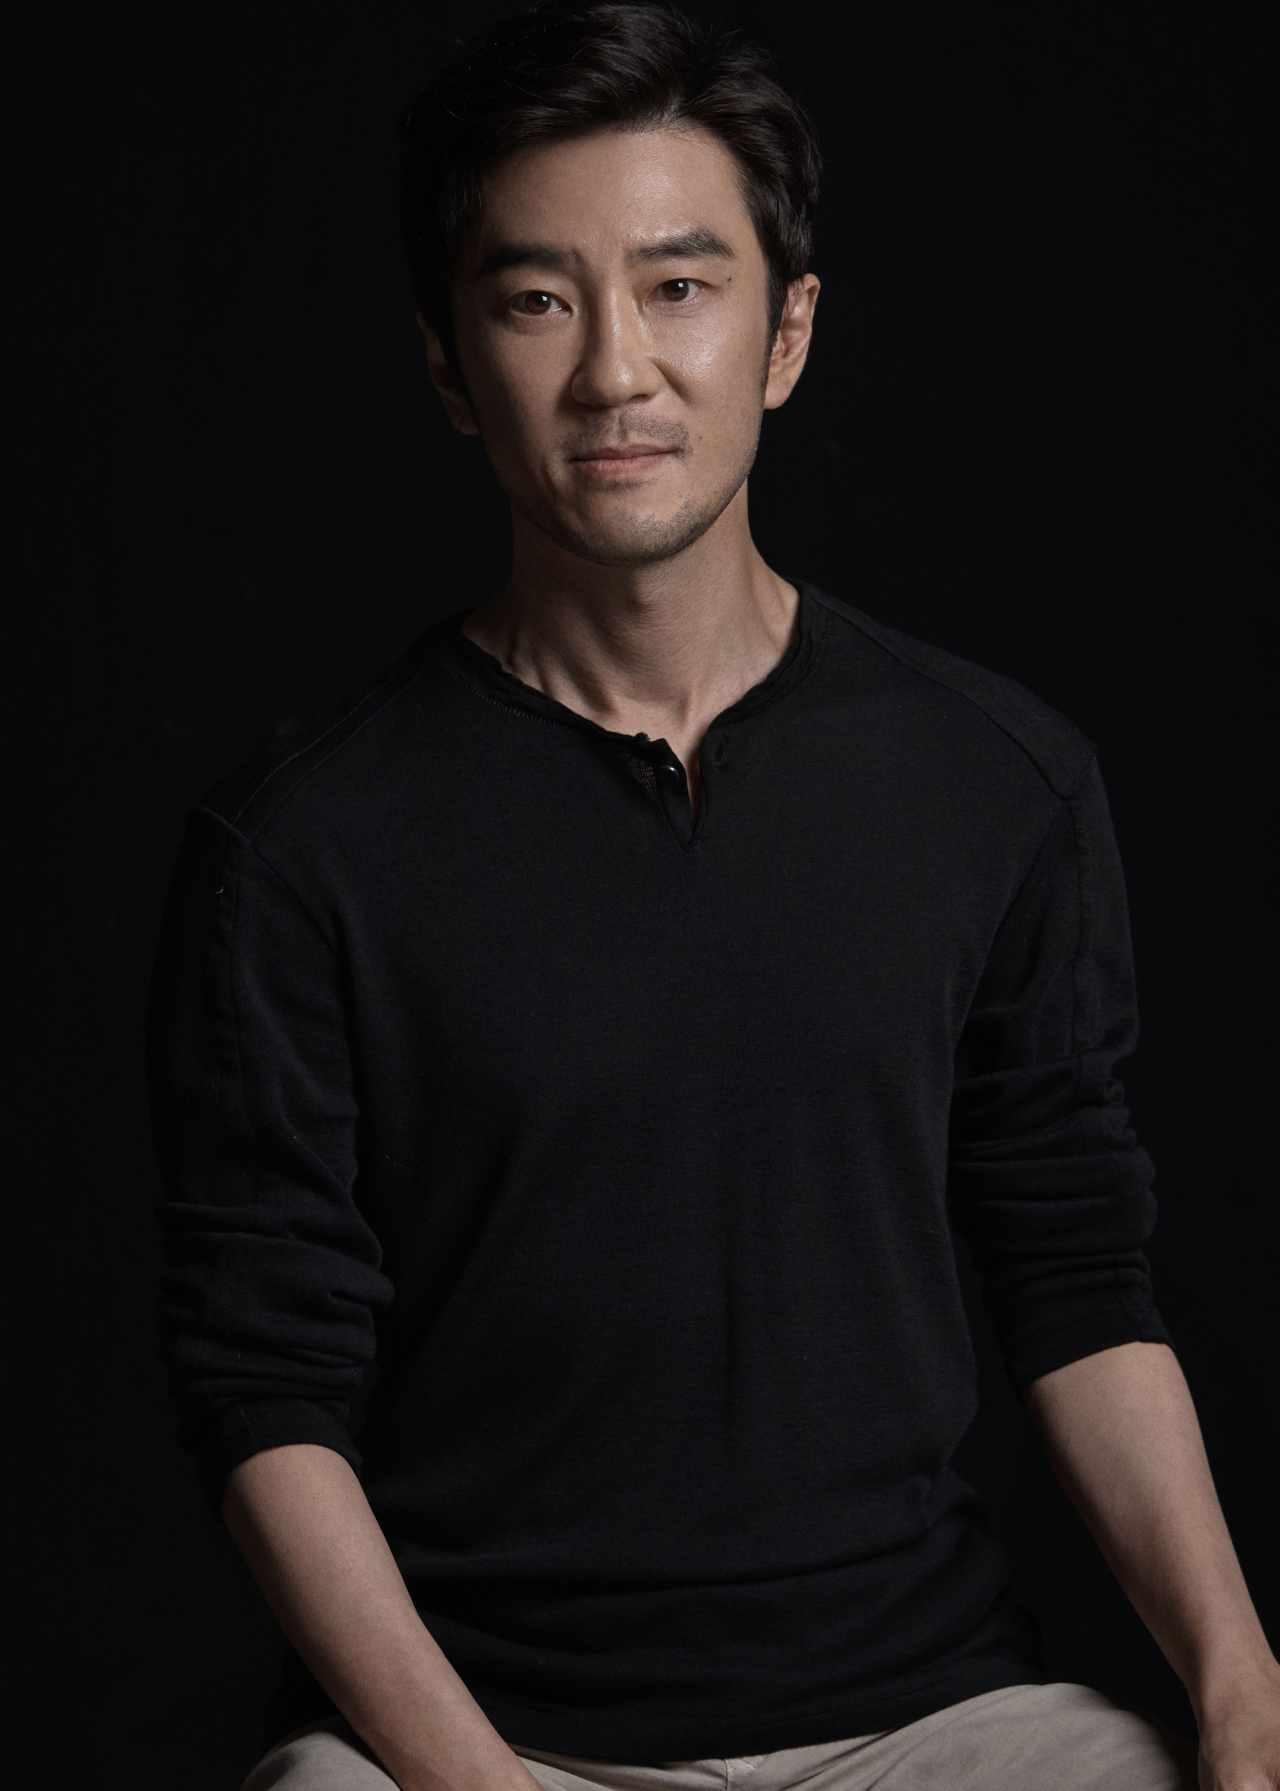 Krafton CEO Kim Chang-han